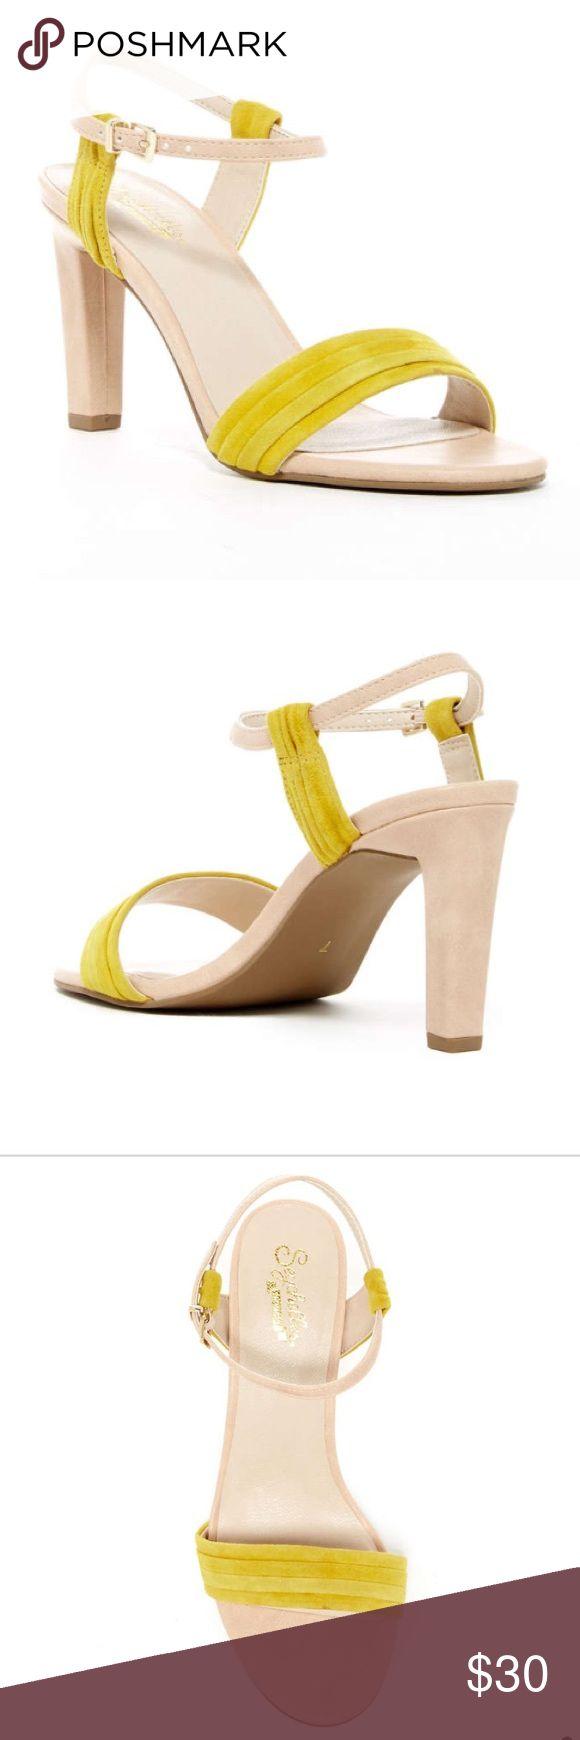 Seychelles yellow and tan Prime Sandal Seychelles yellow and tan Prime Sandal Seychelles Shoes Sandals